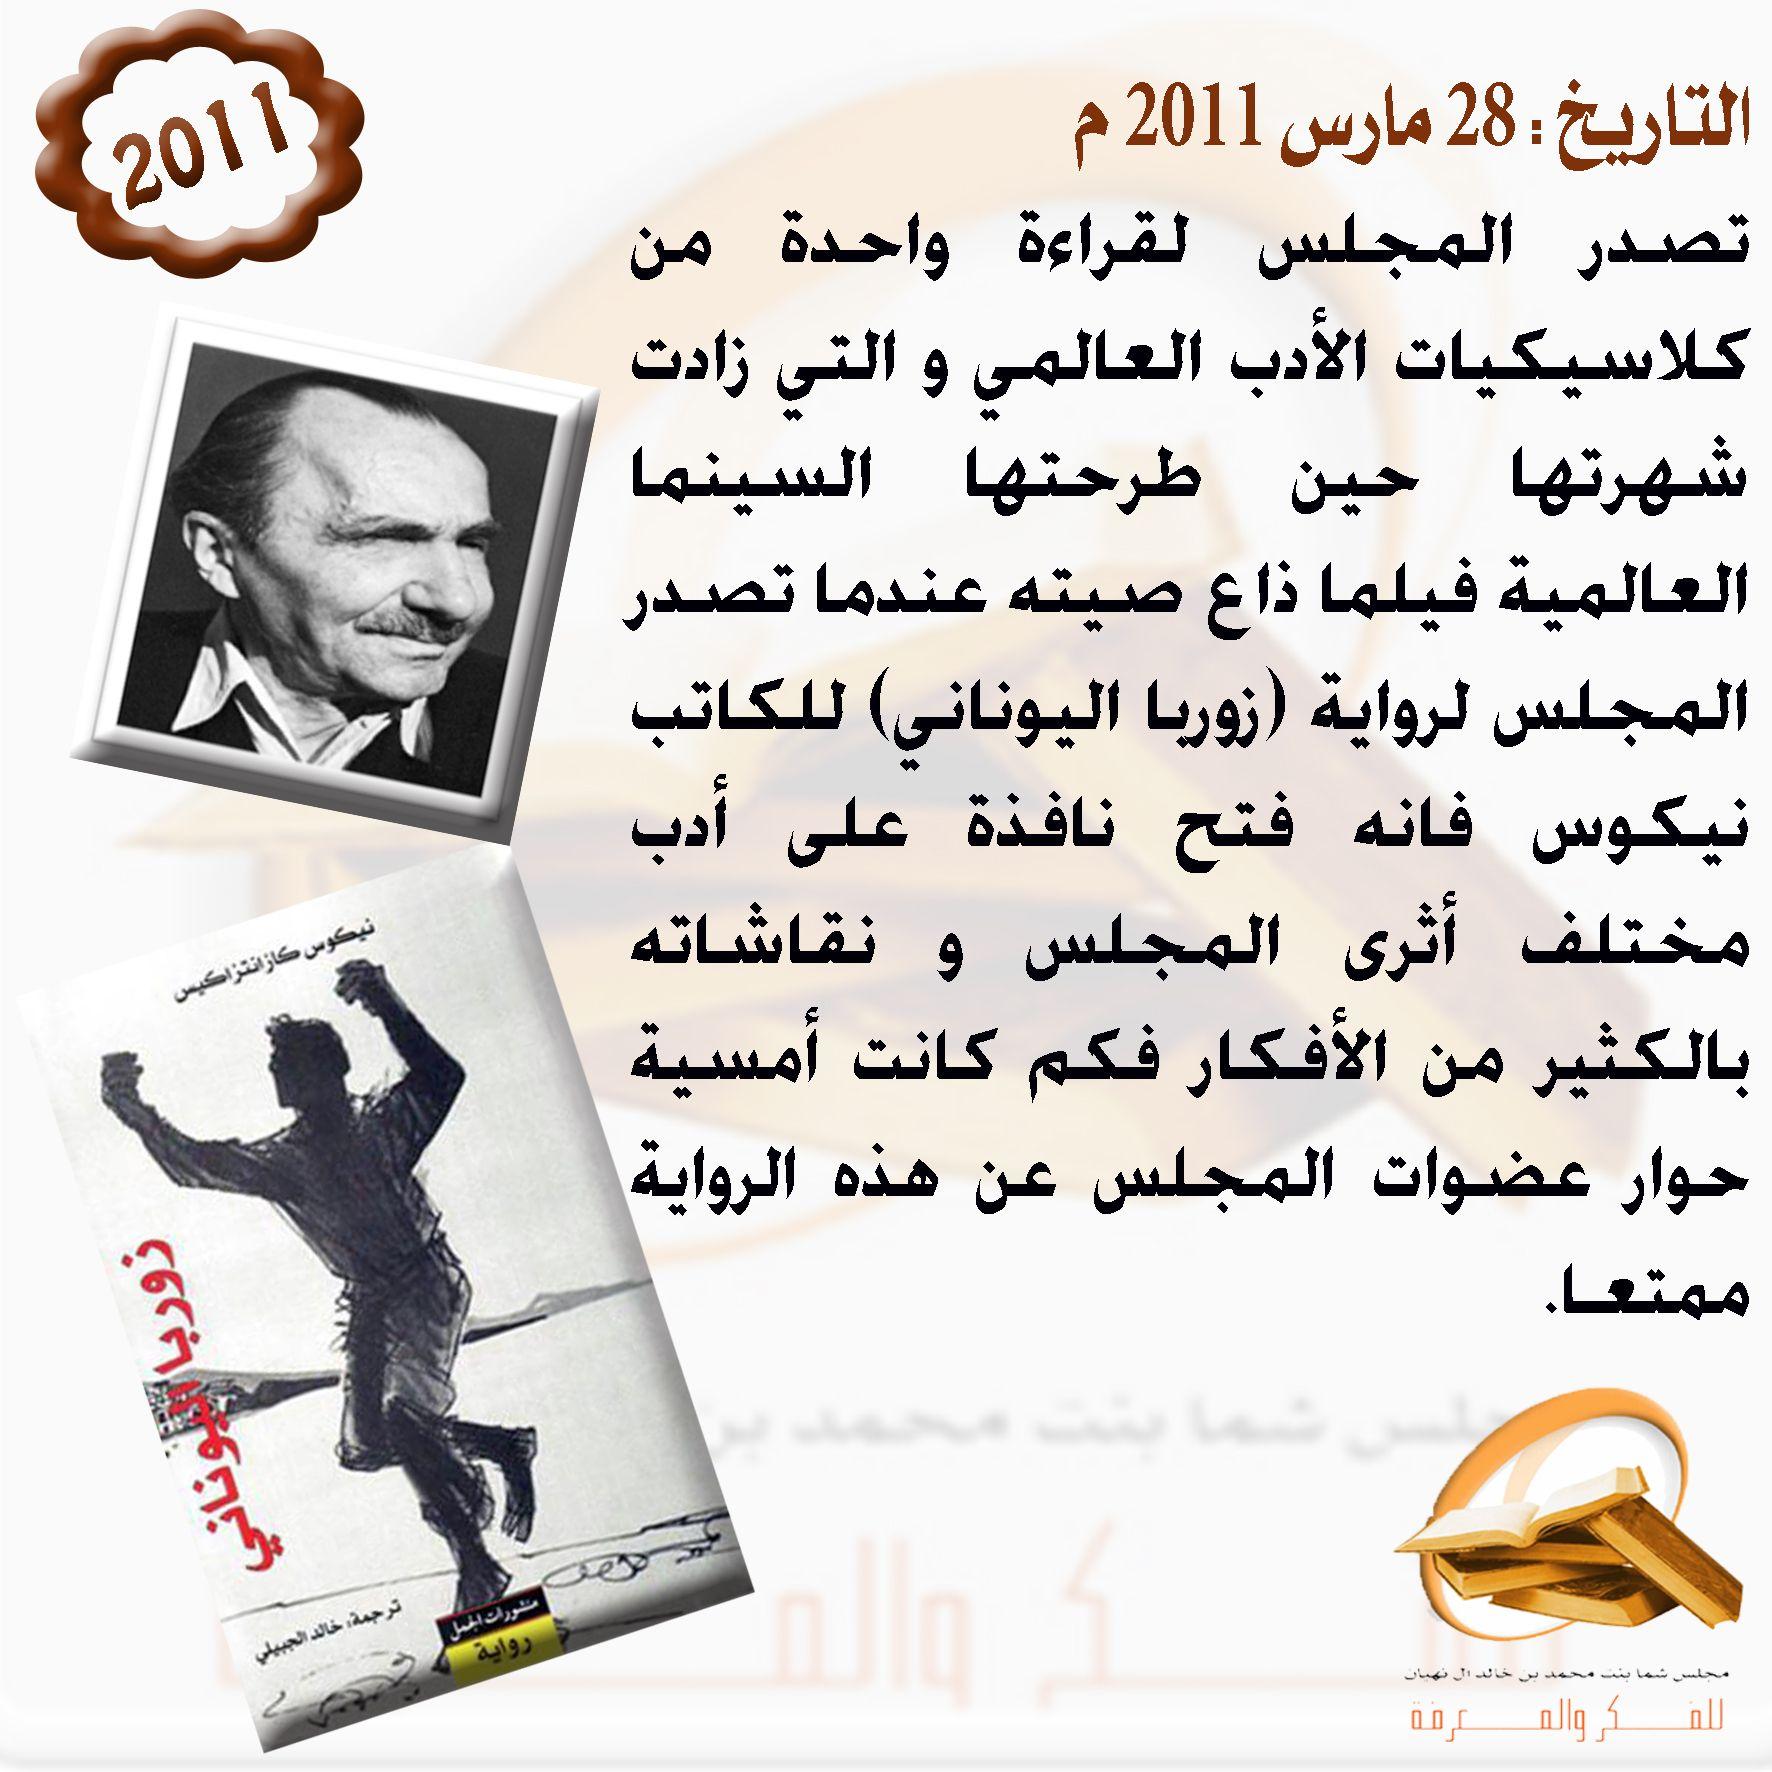 مناقشة رواية زوربا اليوناني 28 مارس 2011م Lias Movie Posters Lsu